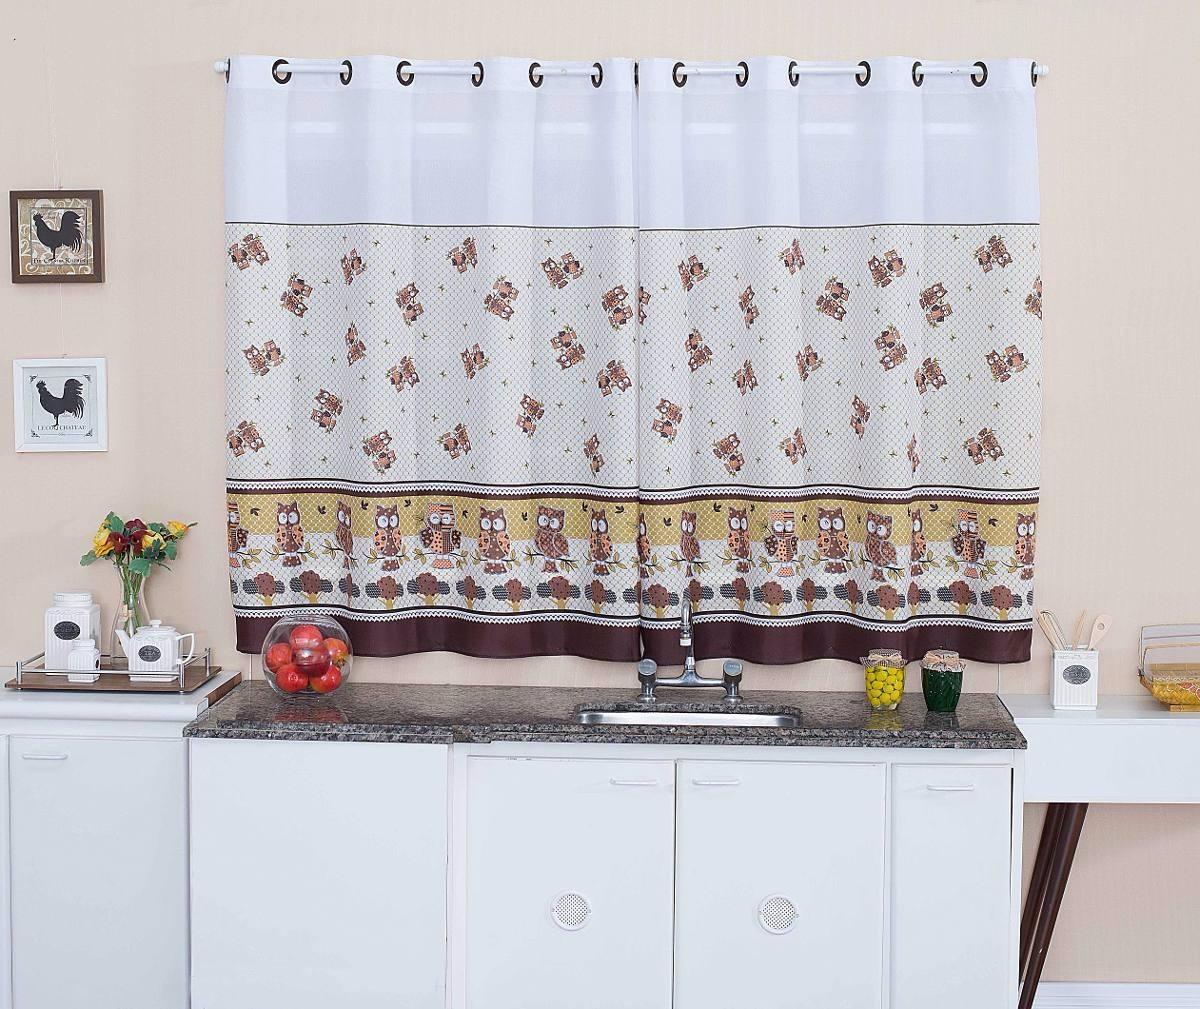 Cortina De Cozinha 2 00 X1 50 C Kit Var O Simples Corujinha R 60